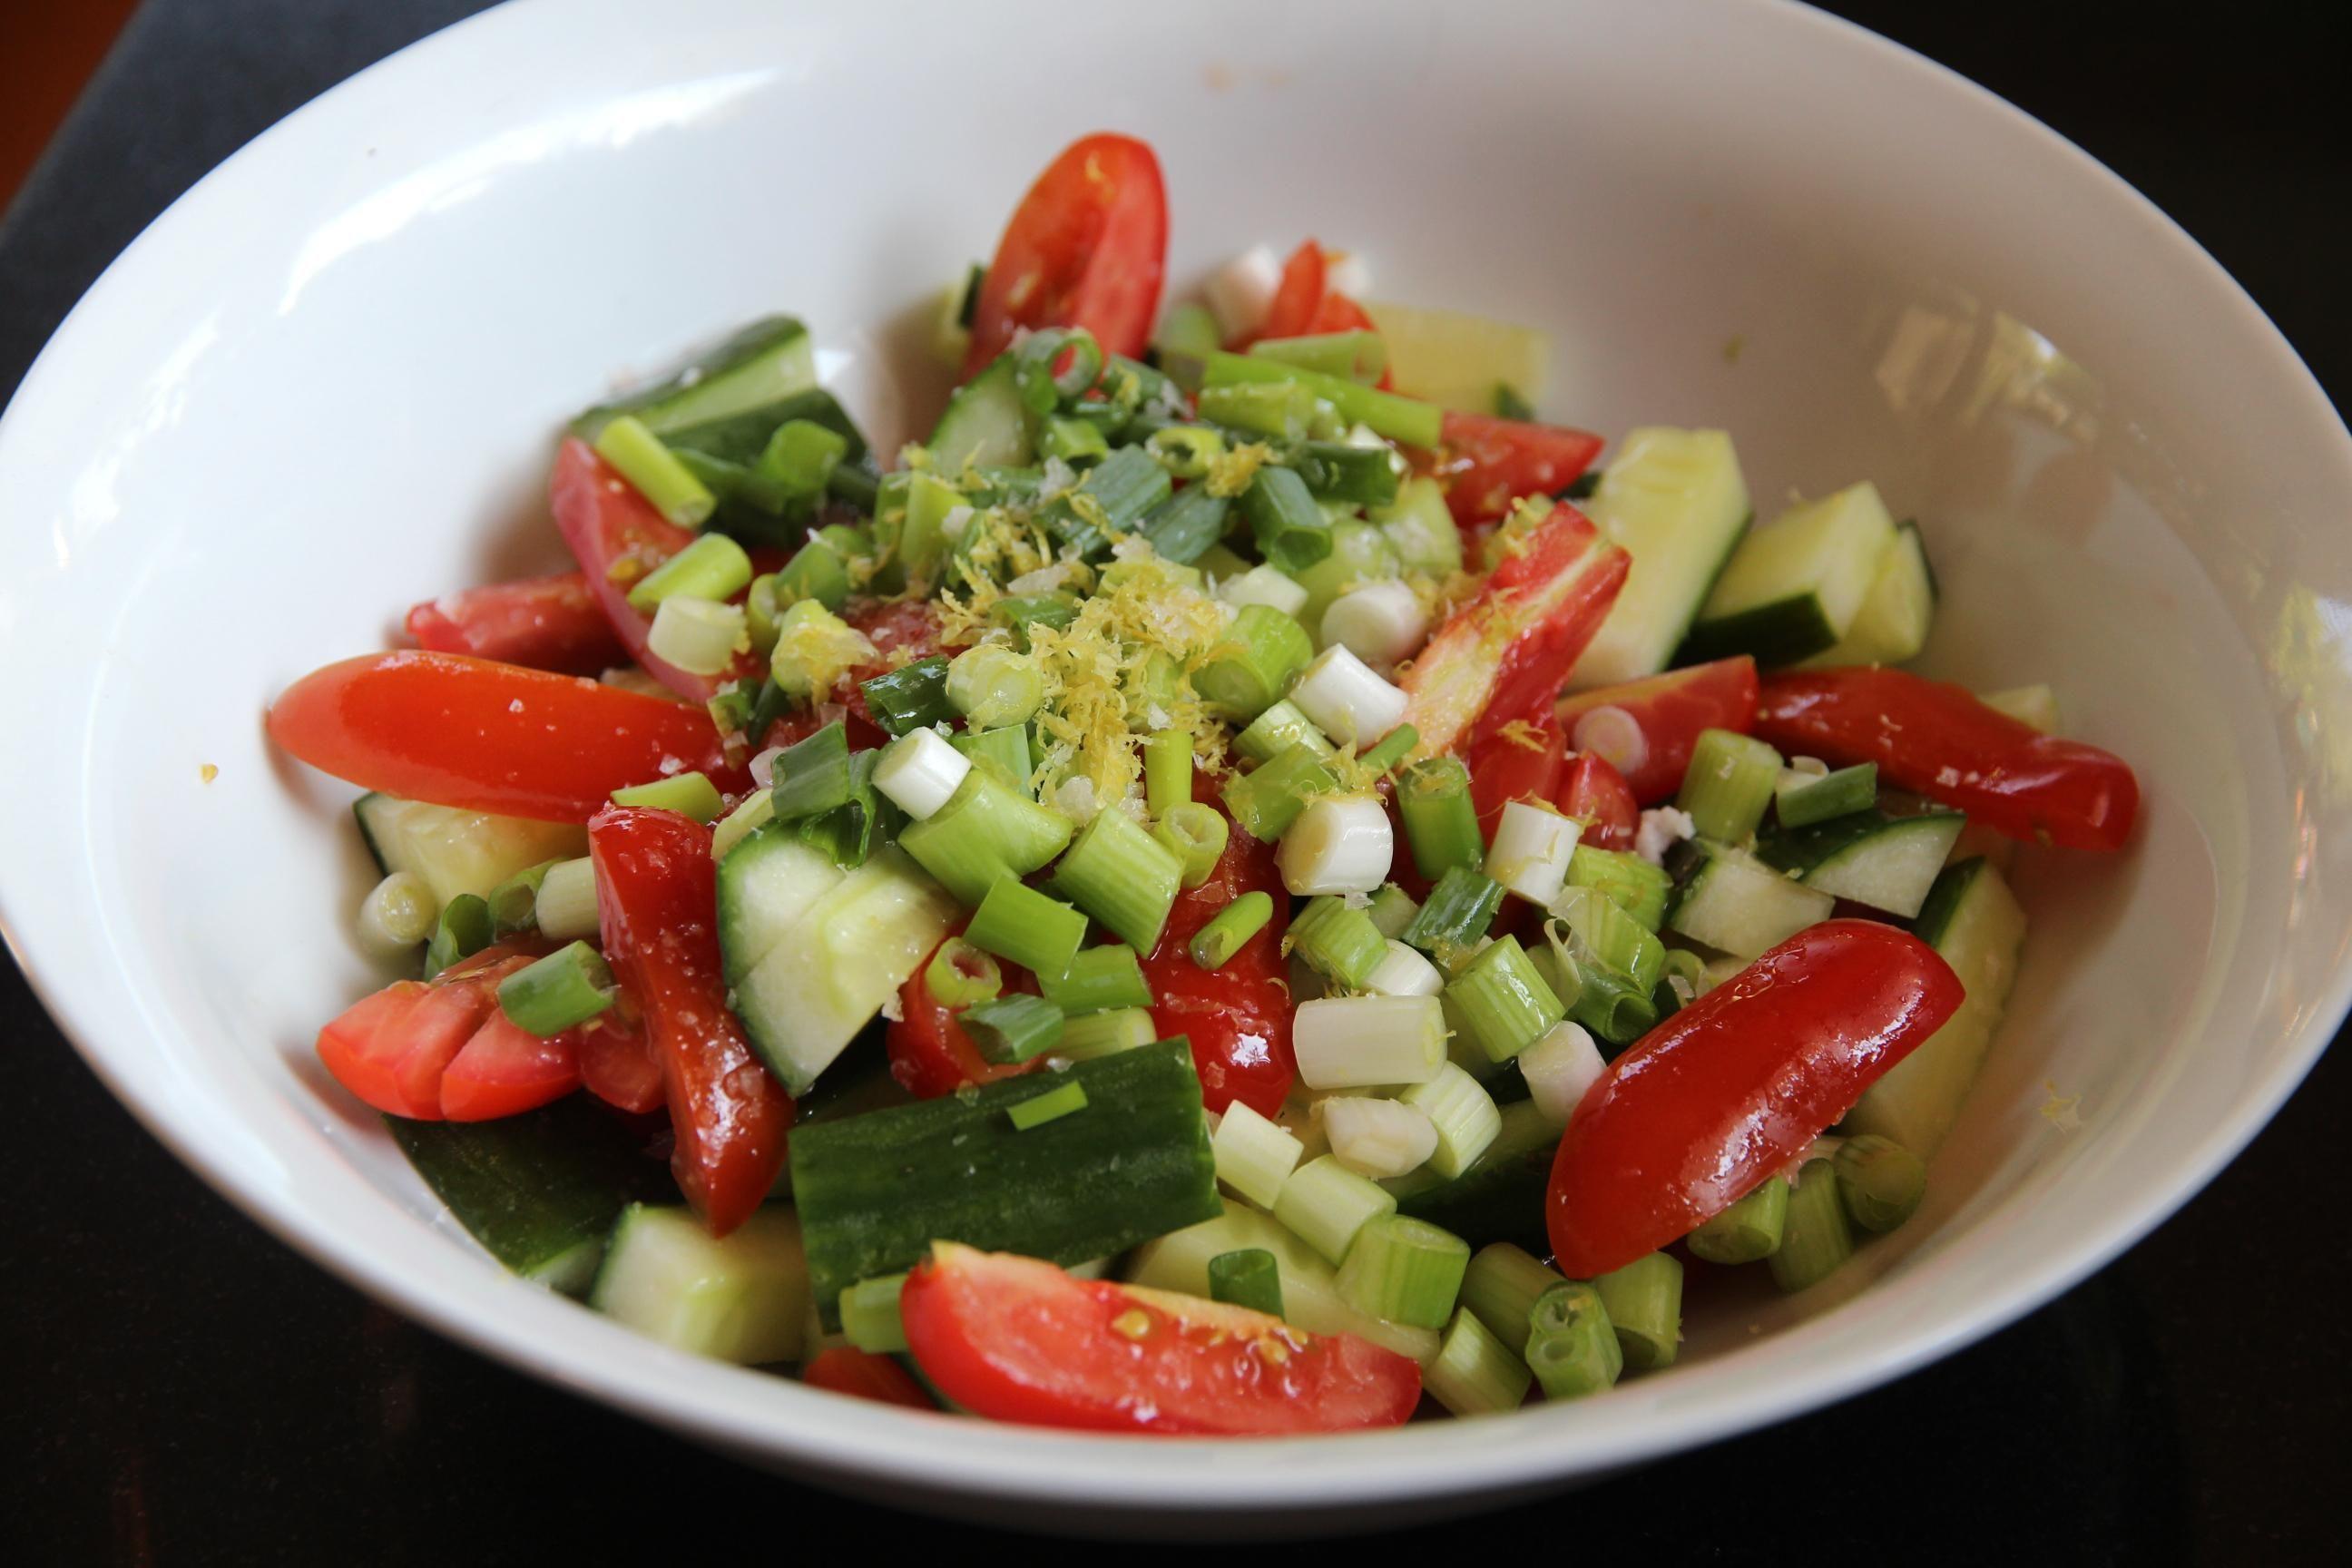 Delicious Aloo Gobi a popular vegetarian dish of